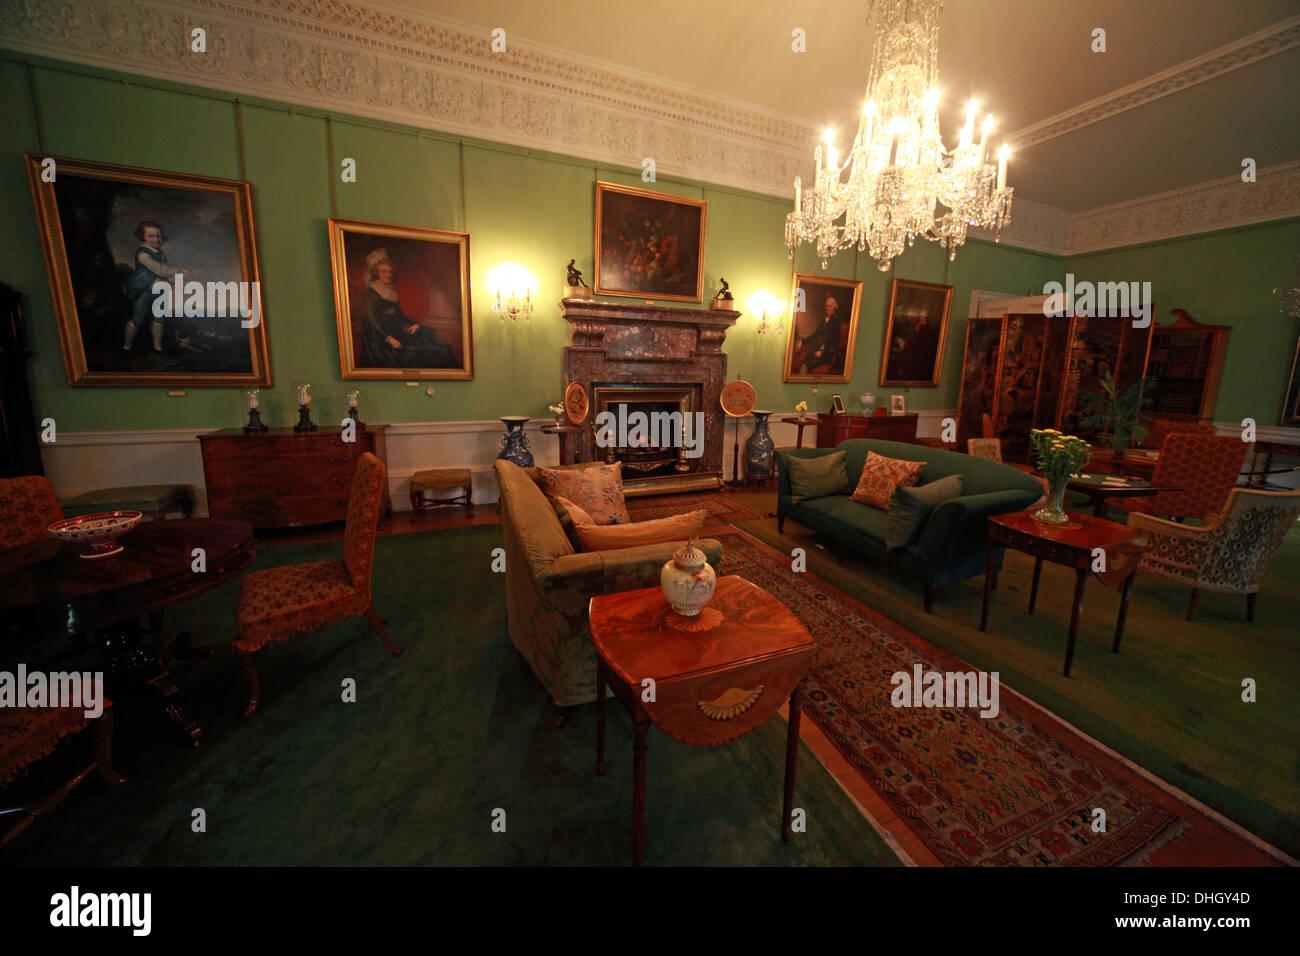 Green Room Dunham Massey, NT, Near Altrincham, Cheshire, England, UK - Stock Image